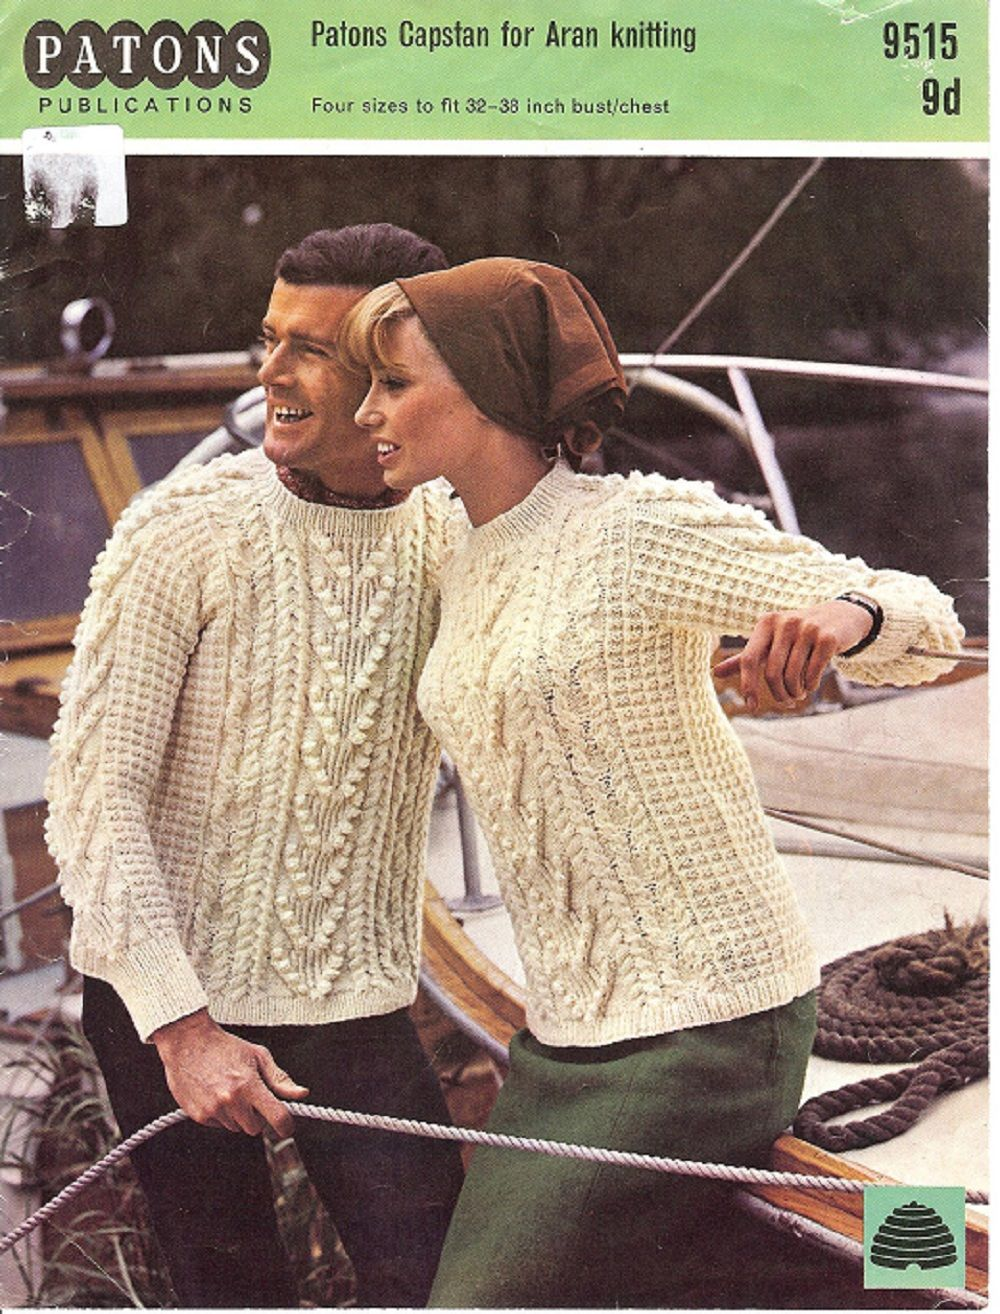 Magnificent Patons Aran Knitting Patterns Embellishment - Blanket ...